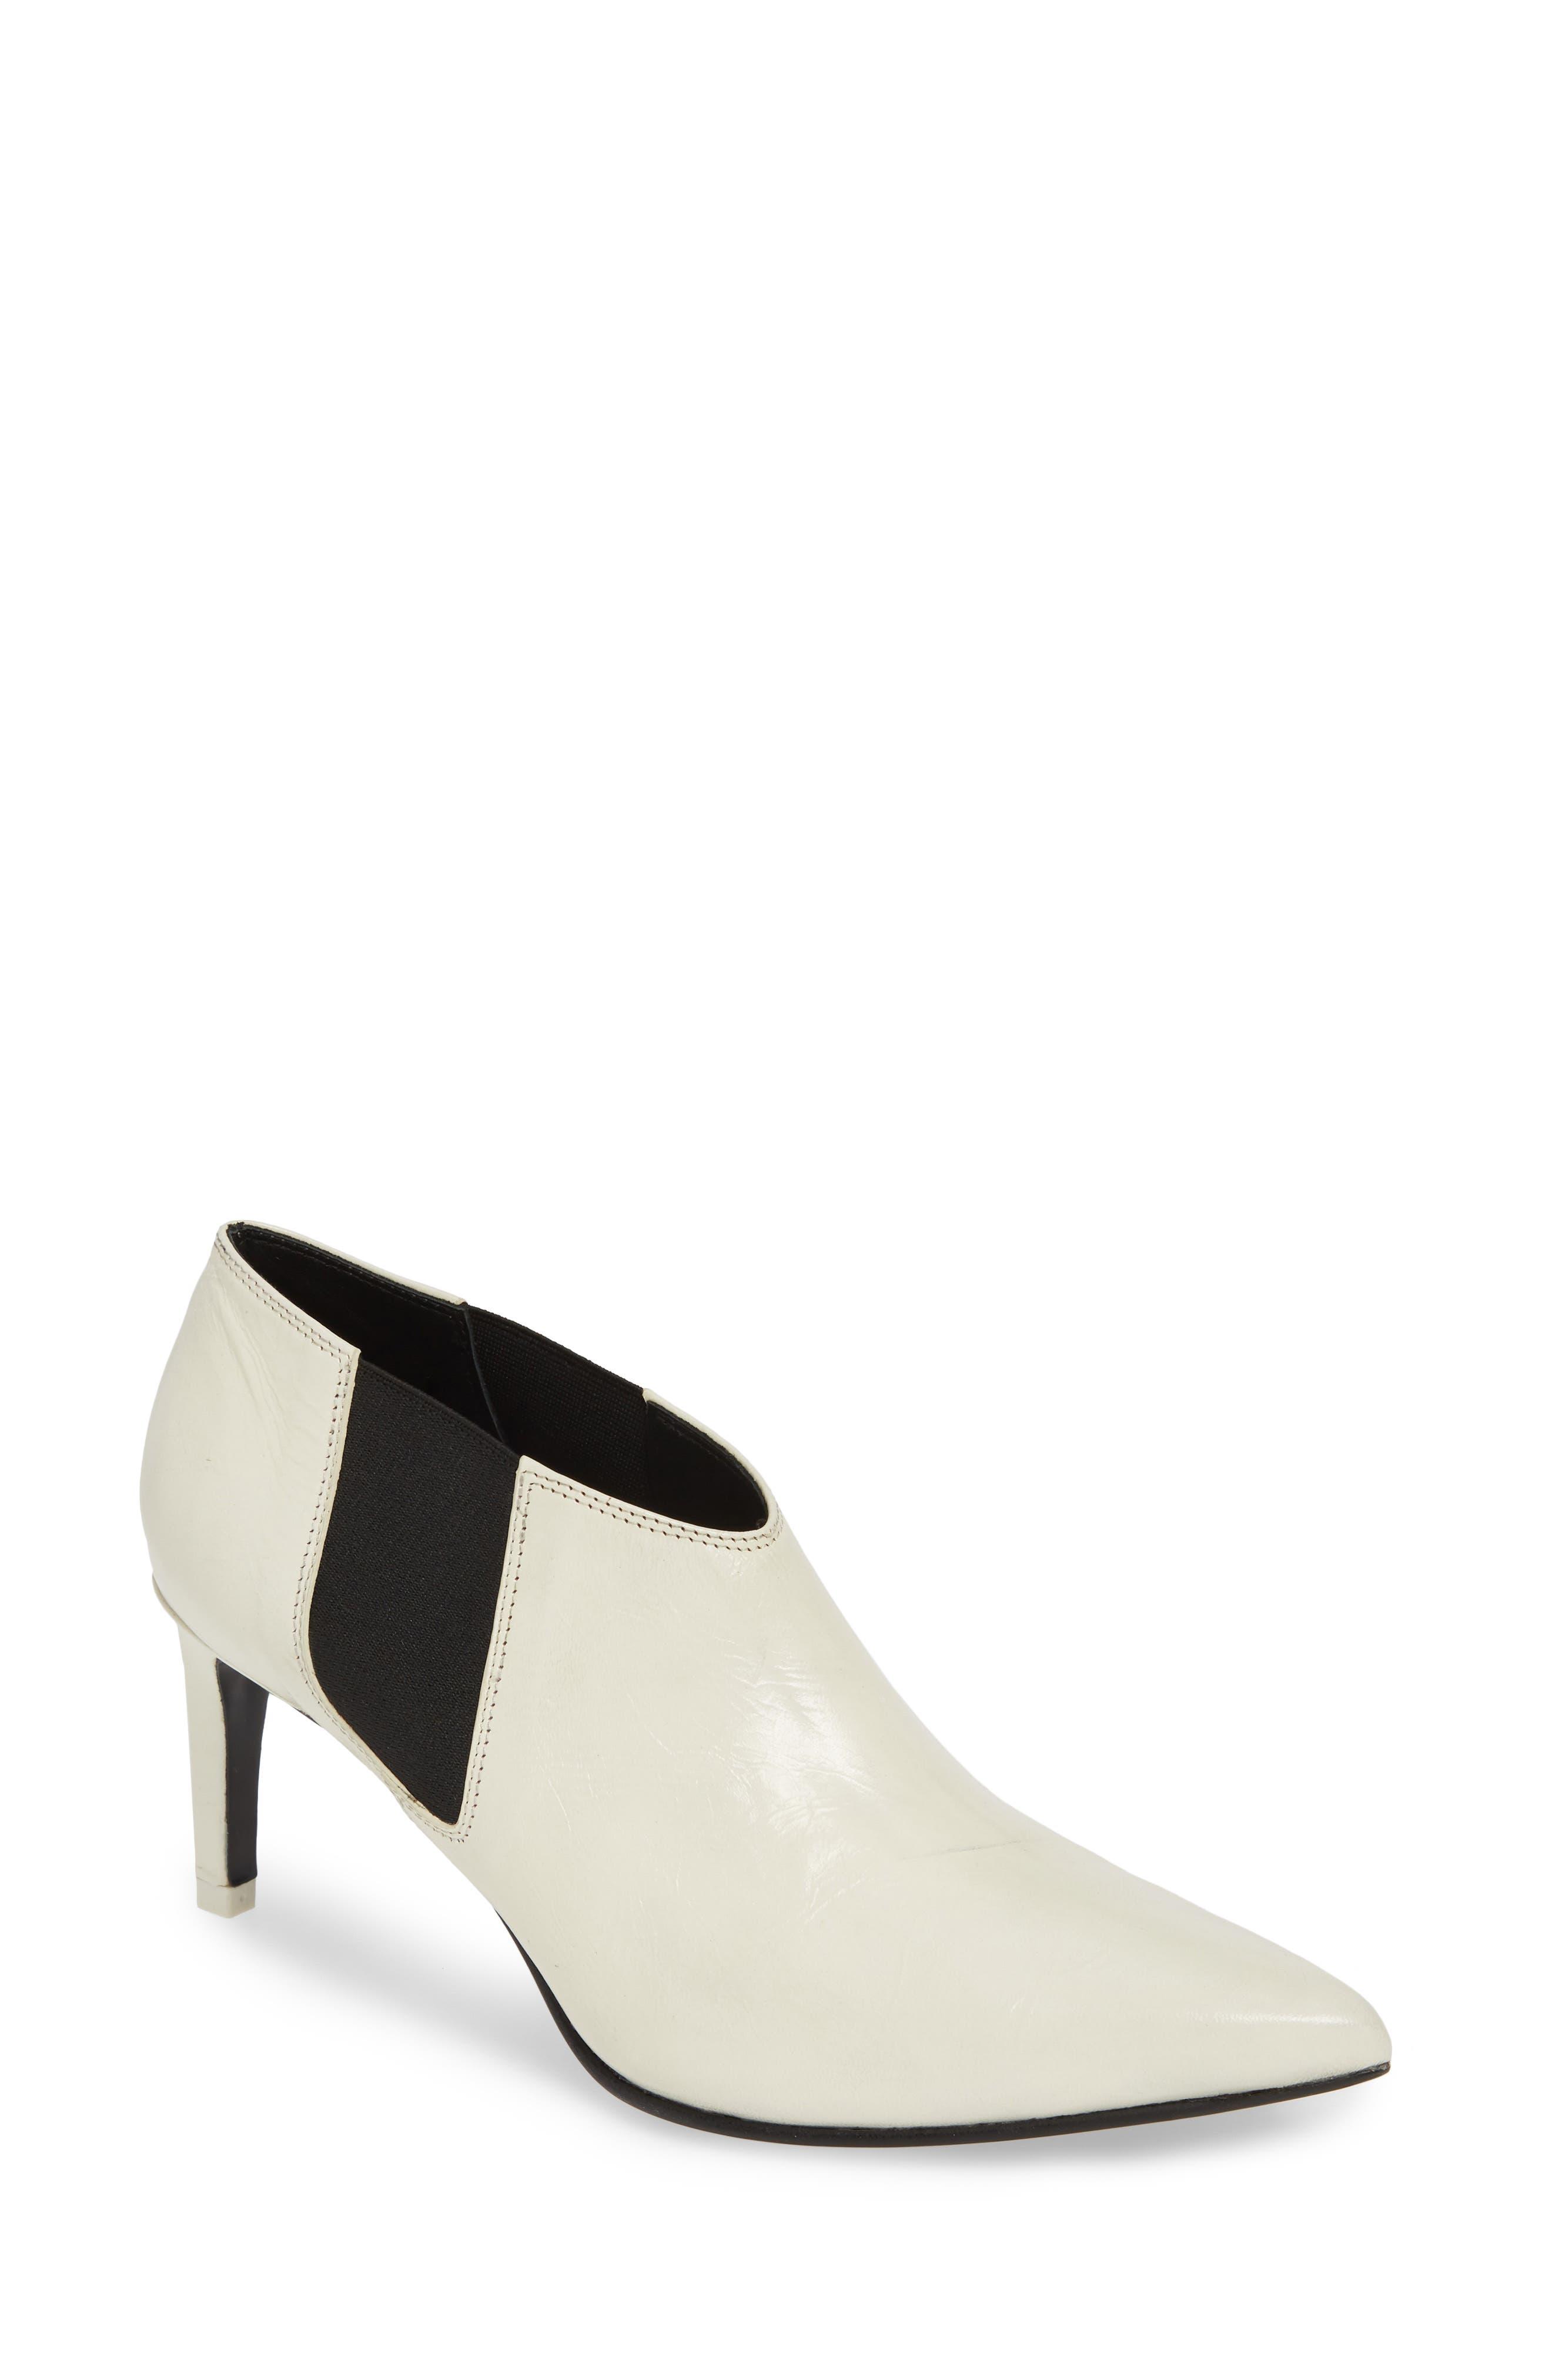 Rag & Bone Beha Chelsea Boot - White